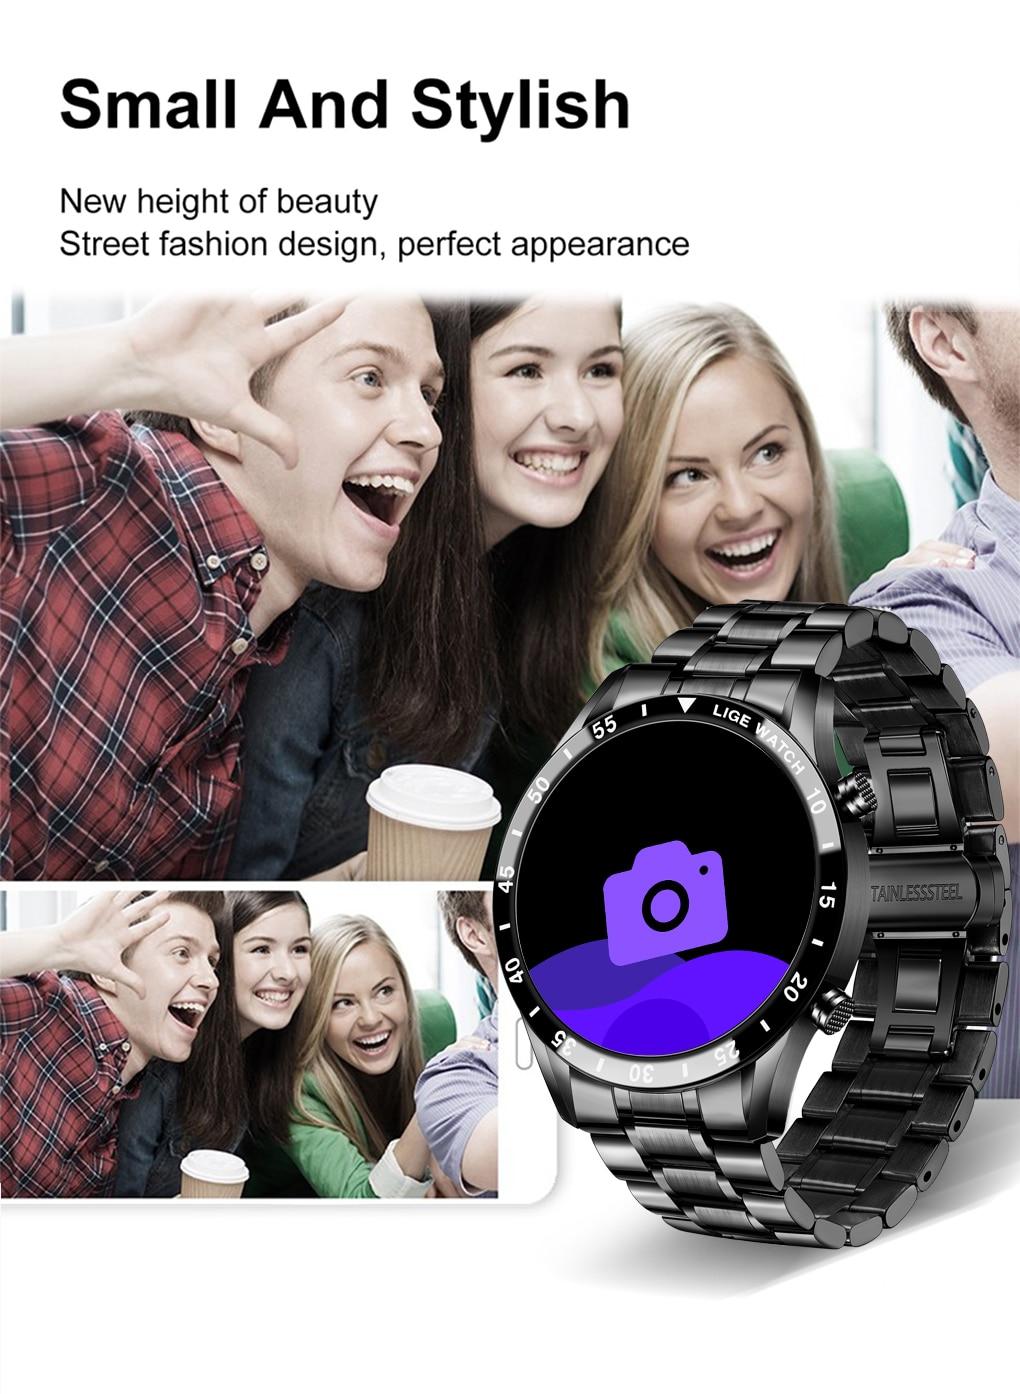 H1669a46651534cacae4673e90d1accc0U LIGE 2021 Full circle touch screen steel Band luxury Bluetooth call Men smart watch Waterproof Sport Activity fitness watch+box